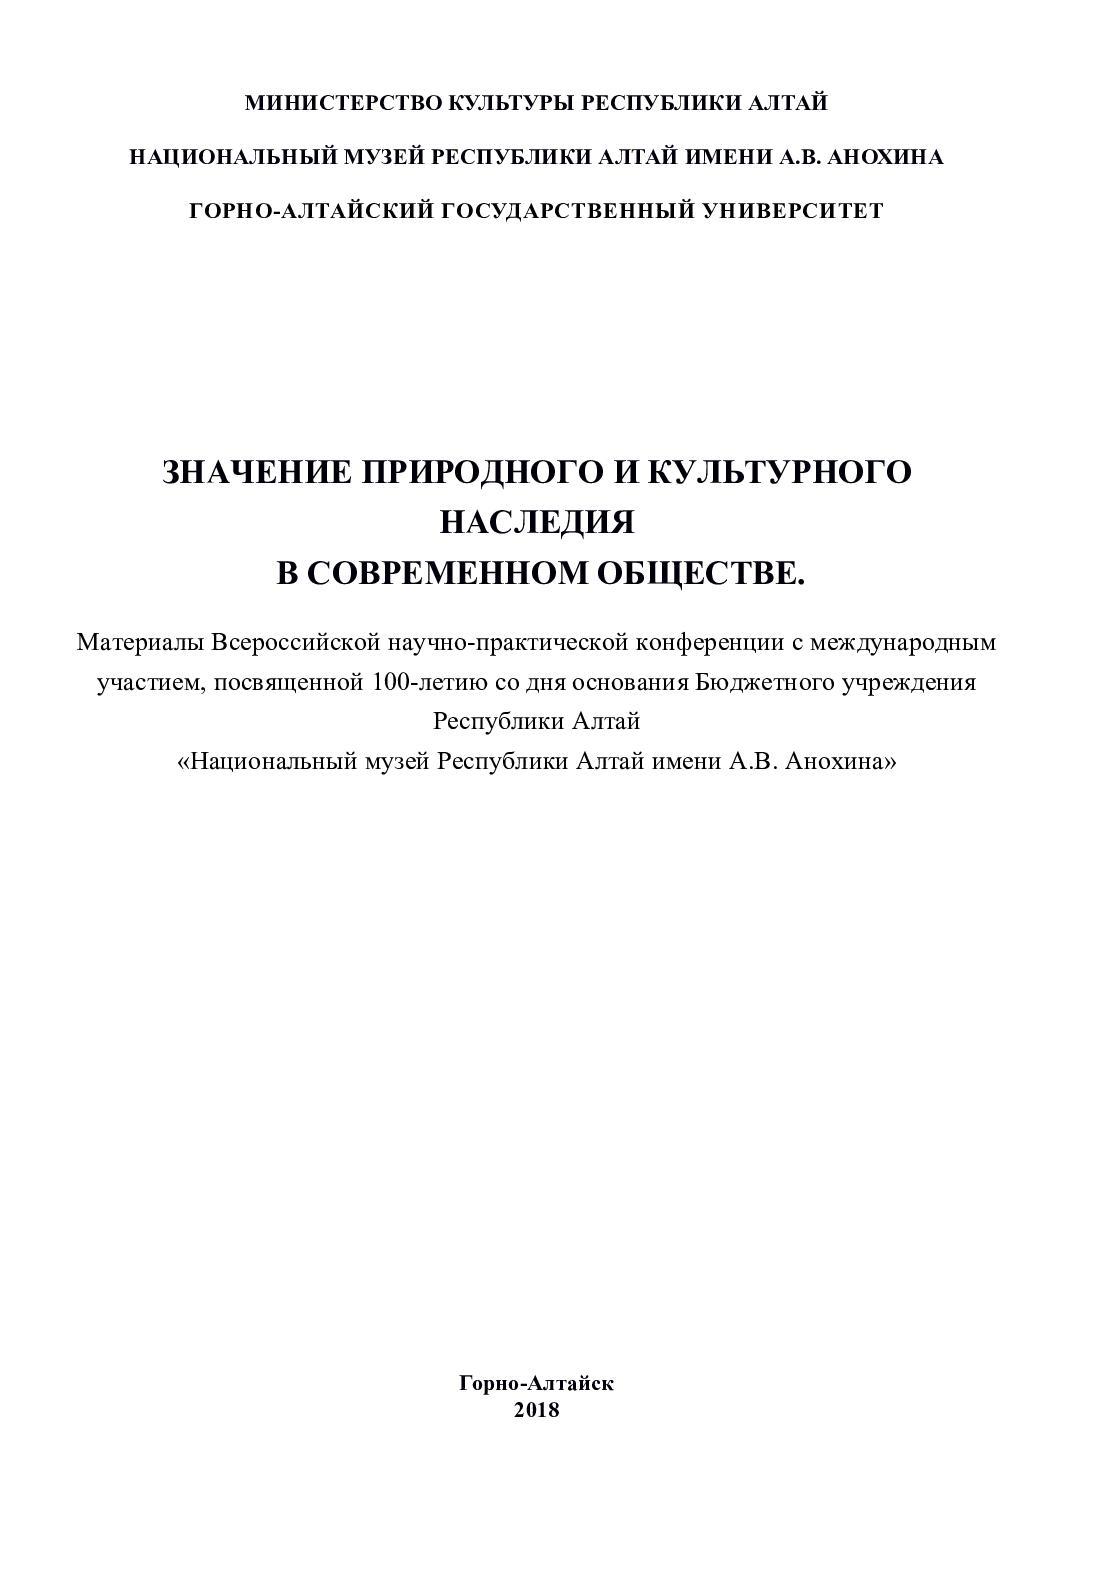 Карта москвы 2020 метро мцд